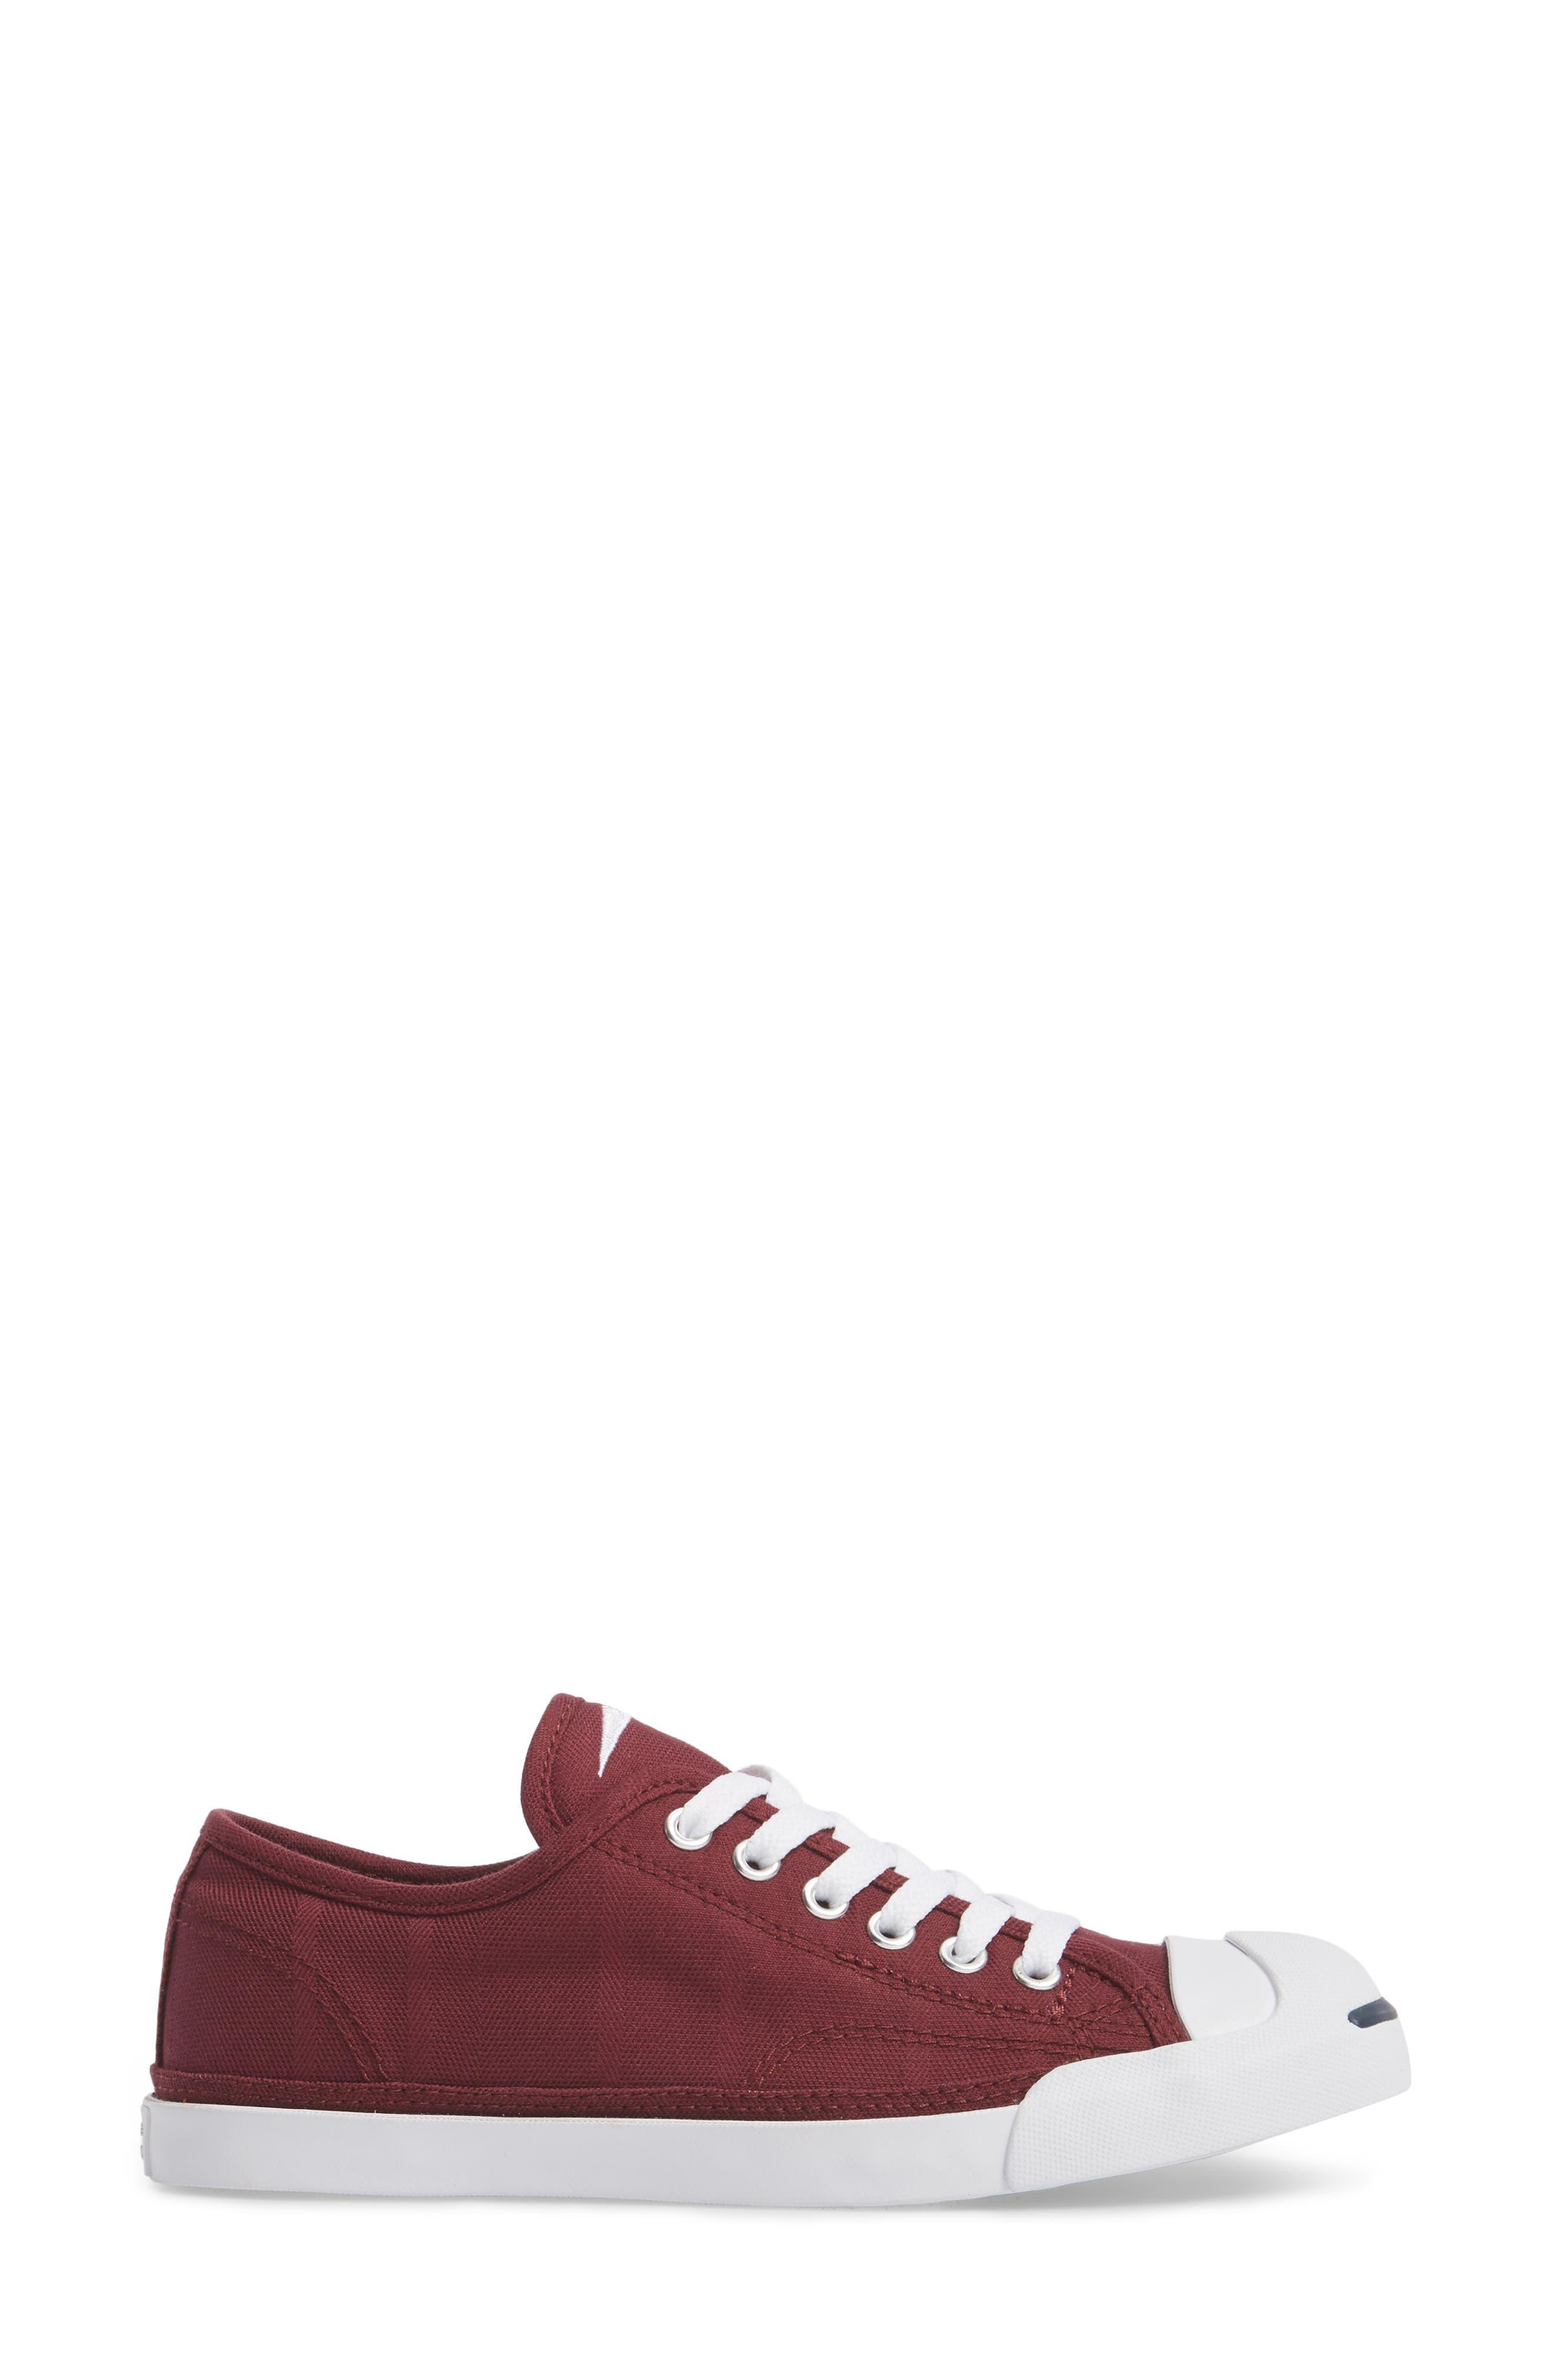 Jack Purcell Low Top Sneaker,                             Alternate thumbnail 3, color,                             DARK BURGUNDY